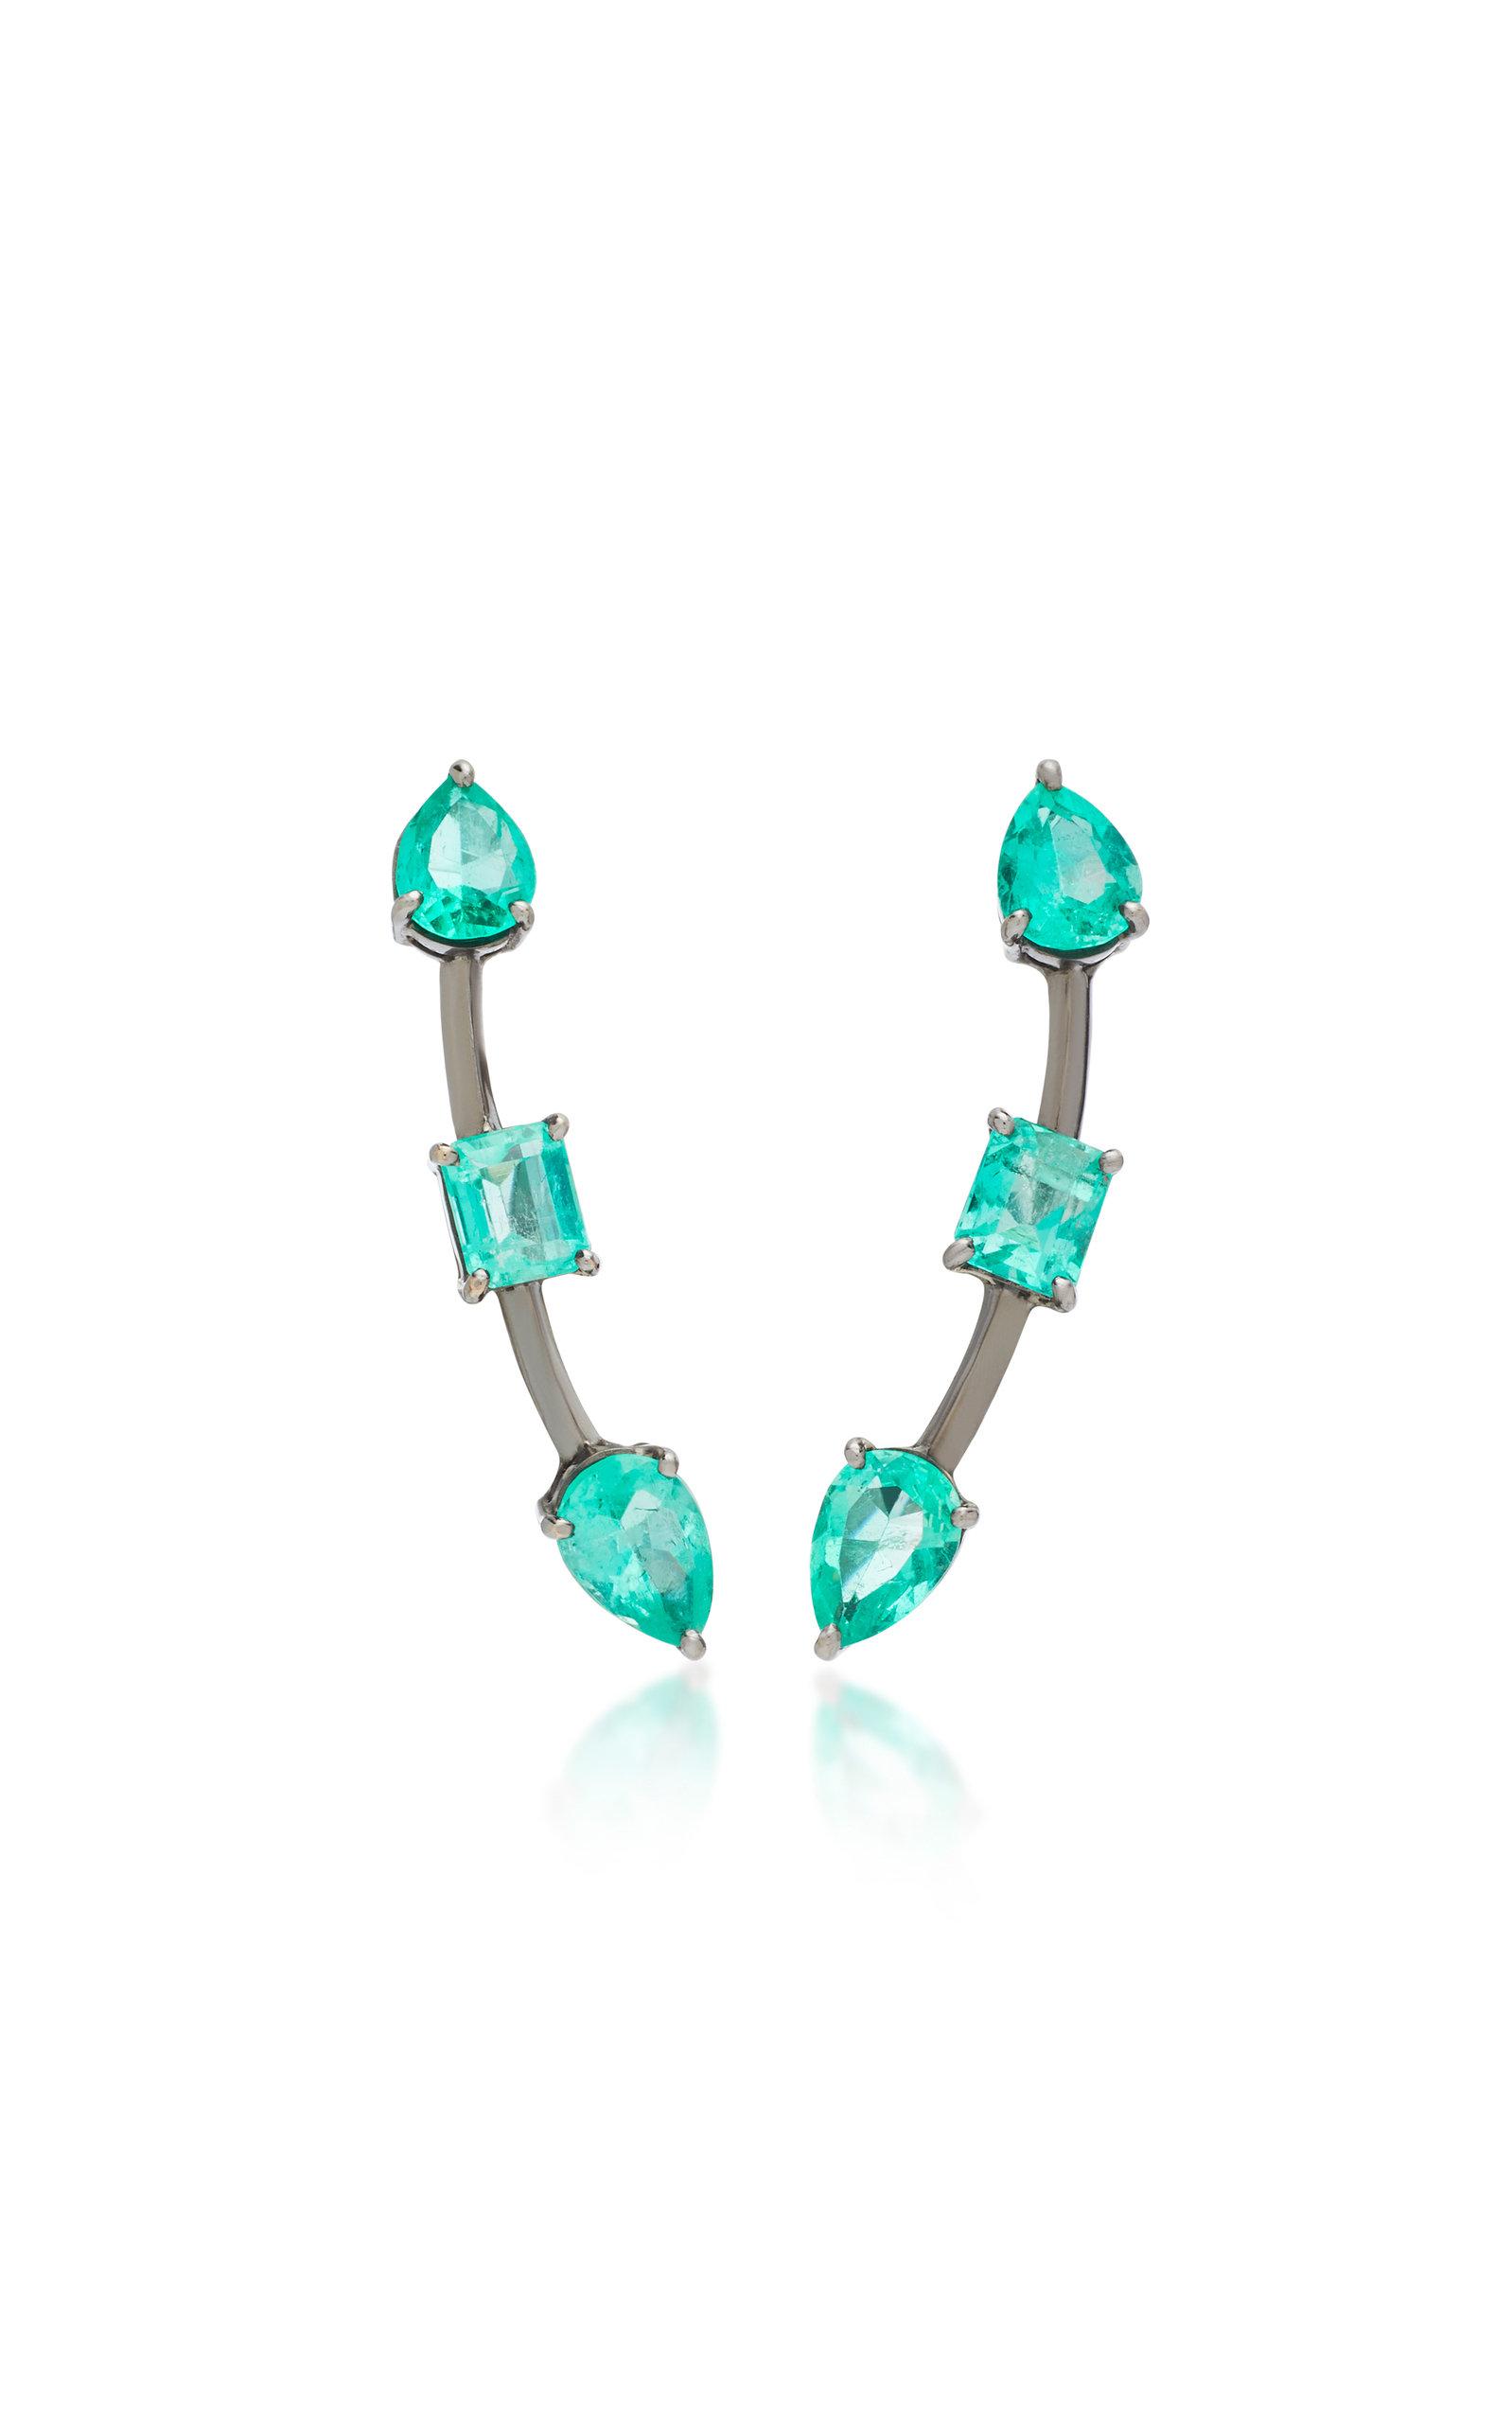 JACK VARTANIAN Rhodium-Plated 18K White Gold Emerald Earrings in Green